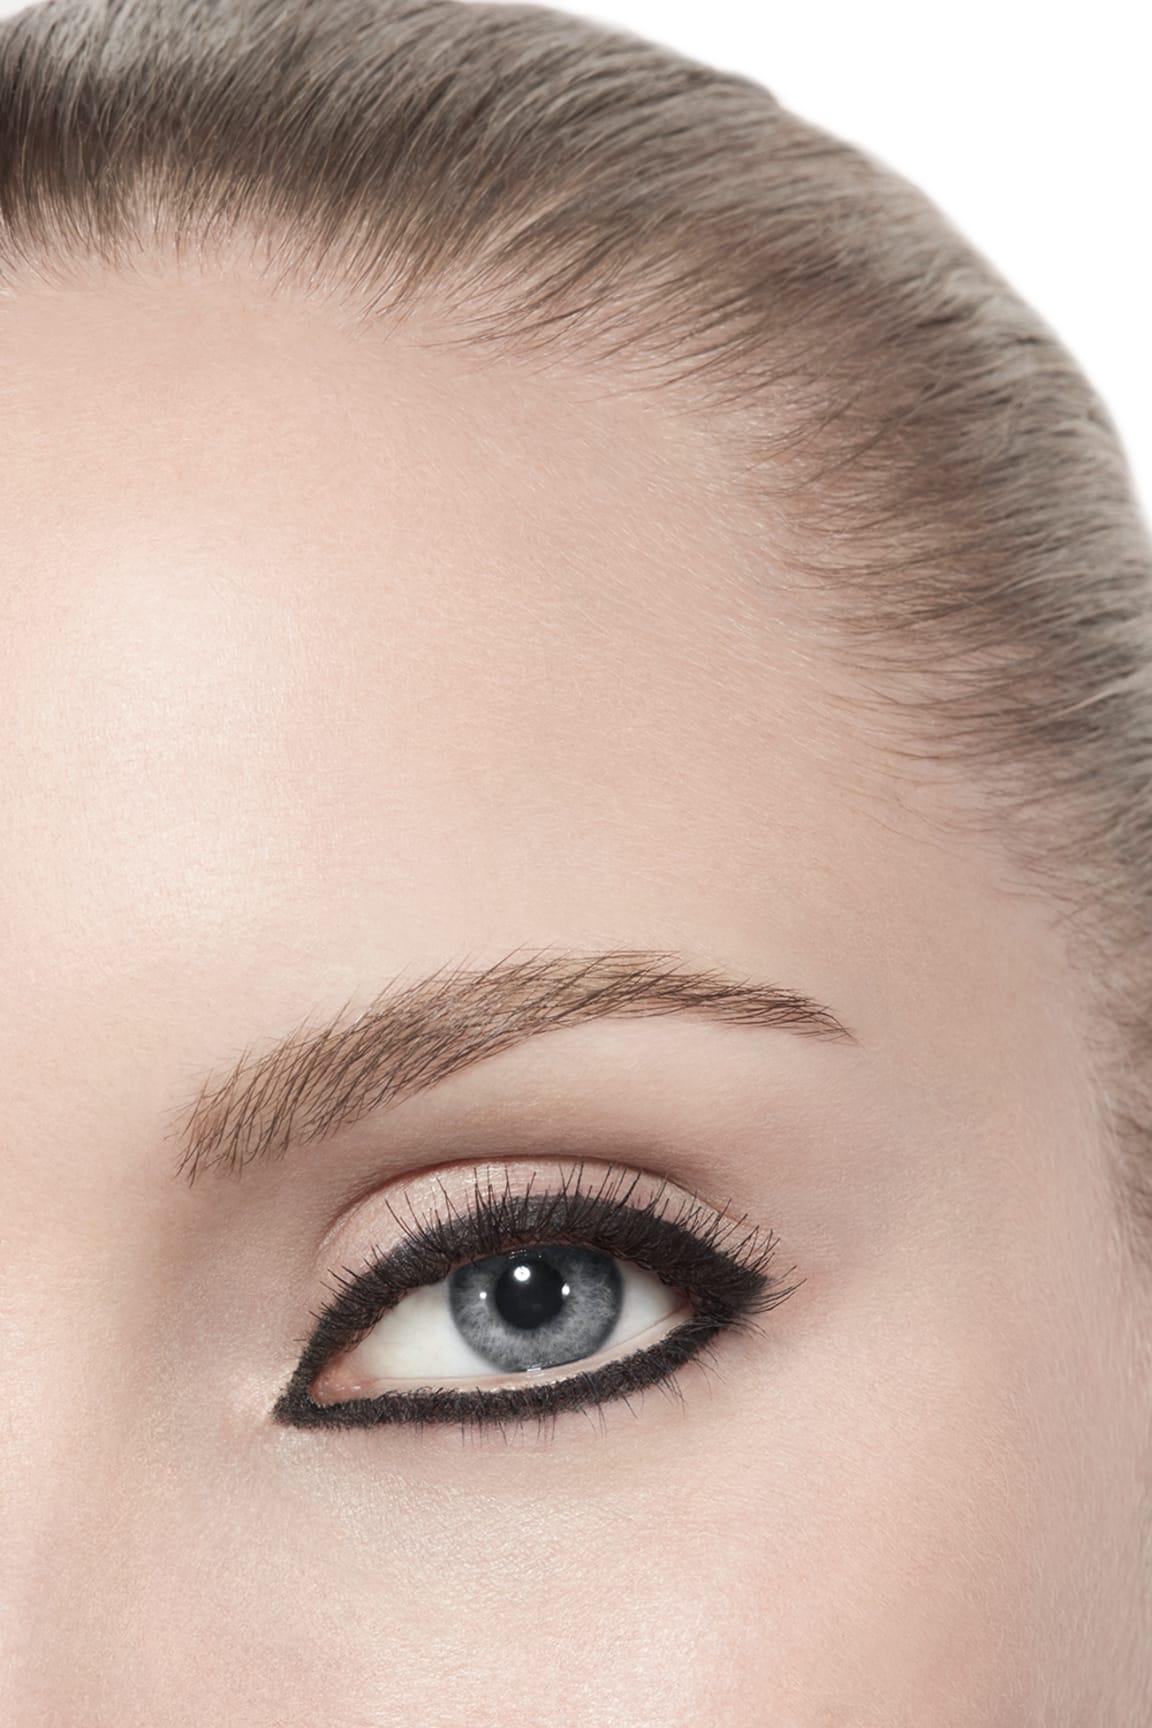 Application makeup visual 3 - STYLO YEUX WATERPROOF 10 - ÉBÈNE